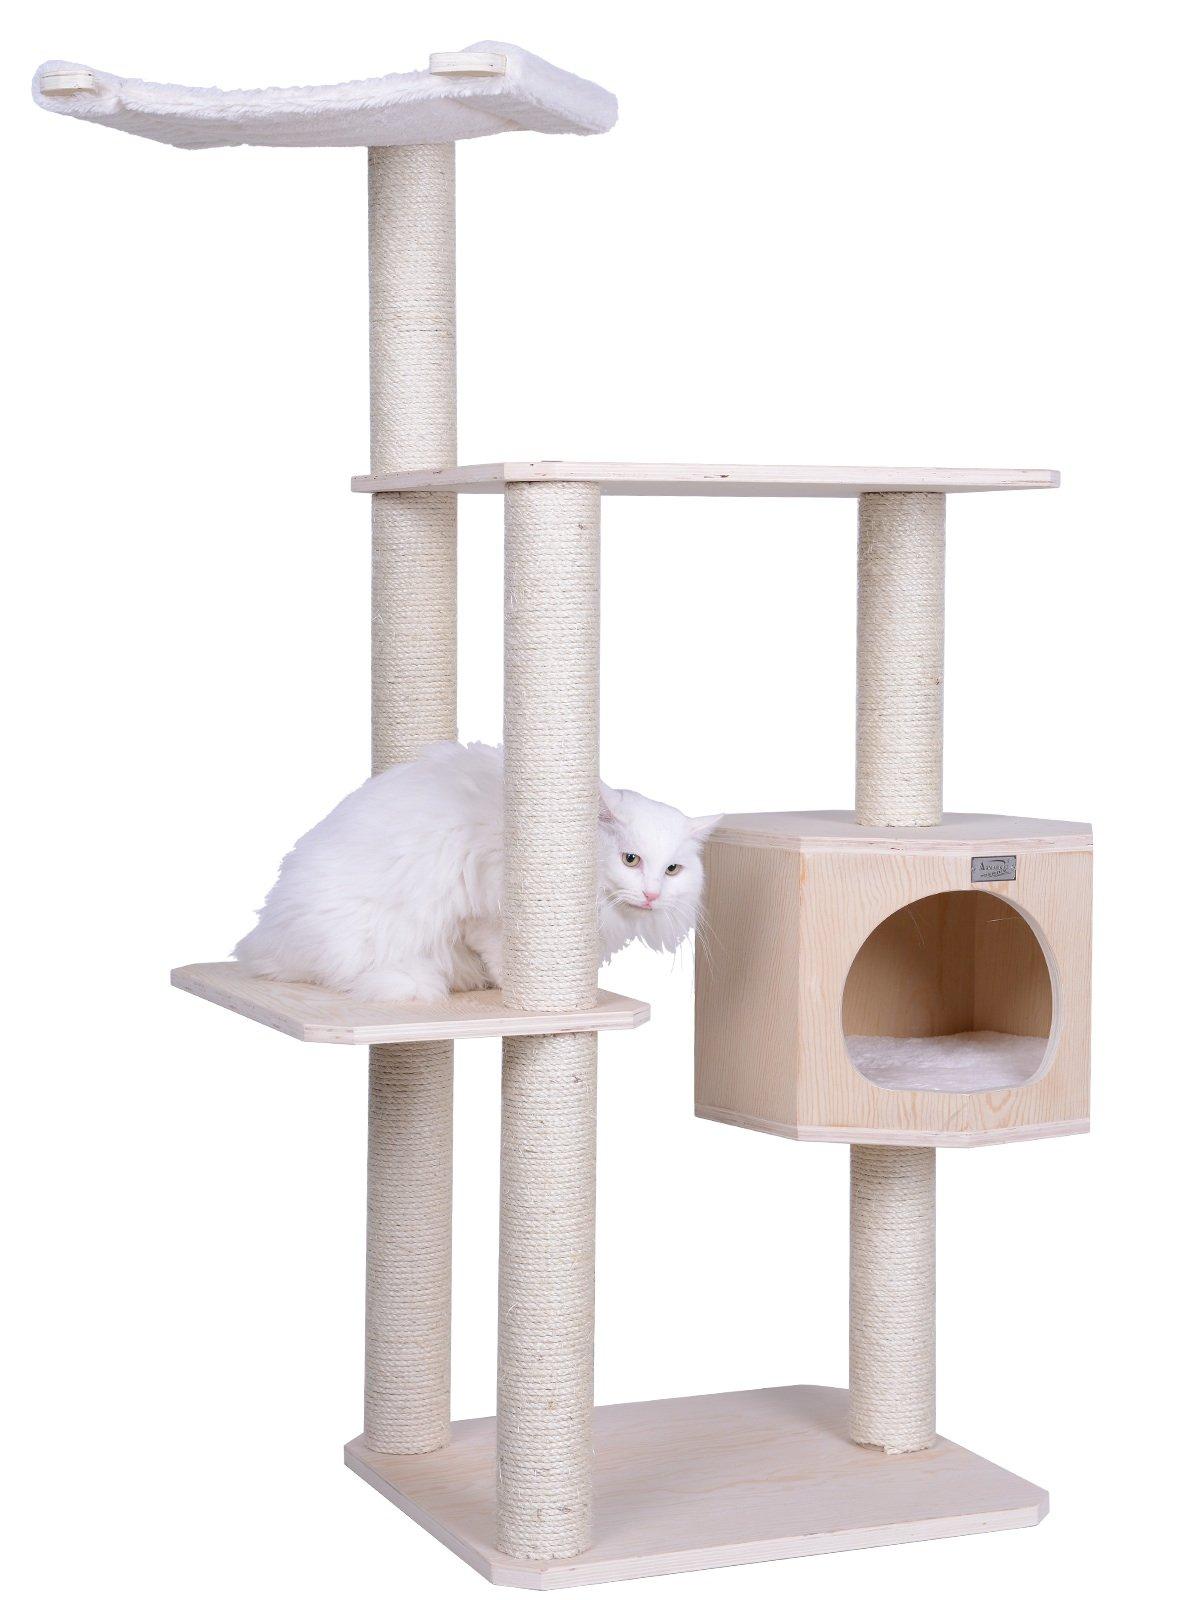 Armarkat S5402 Premium Solid Wood Cat Tree Tower, 54''